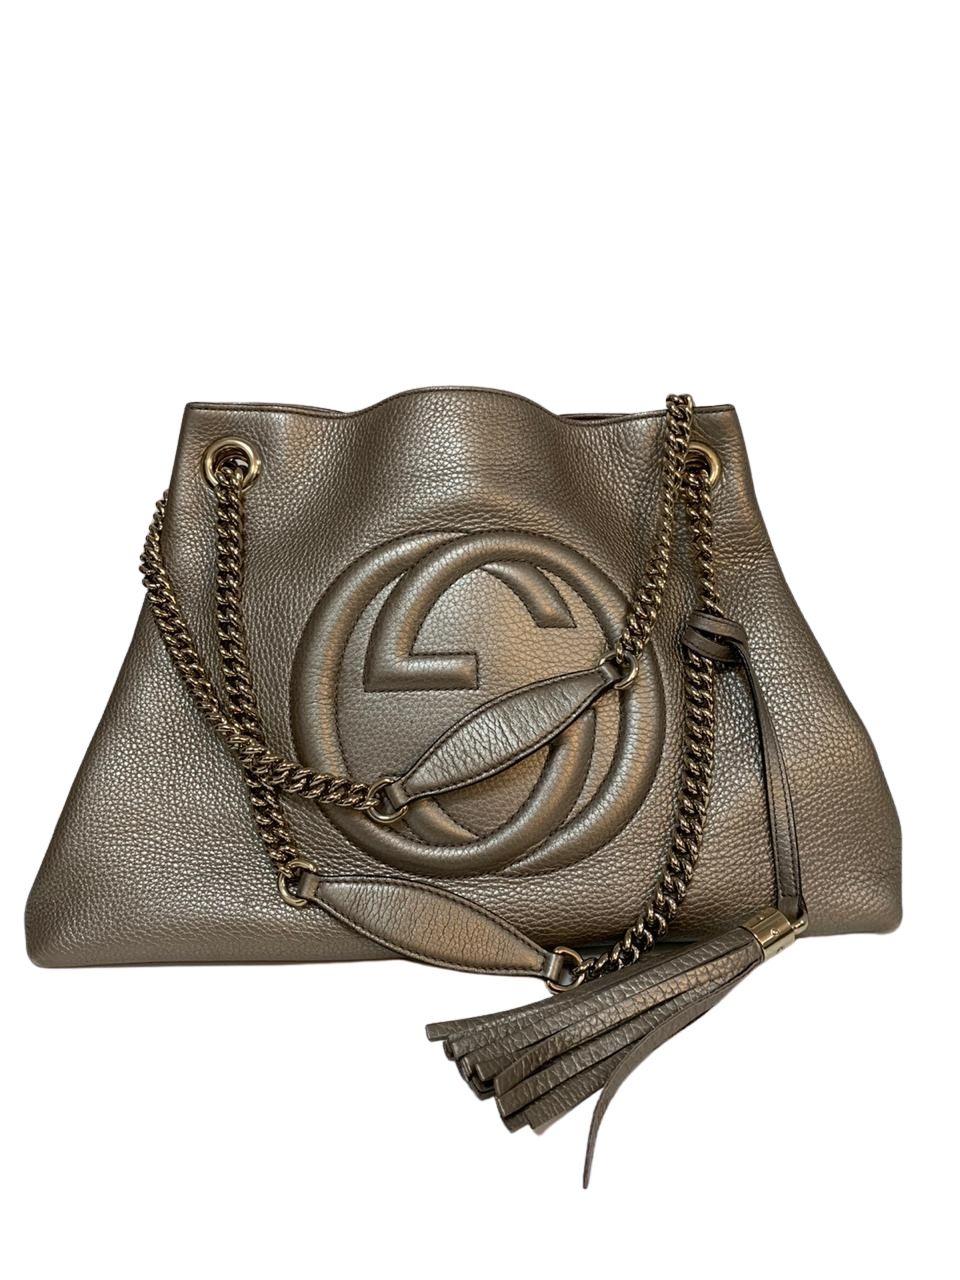 Bolsa Gucci Soho Chain Metalizada